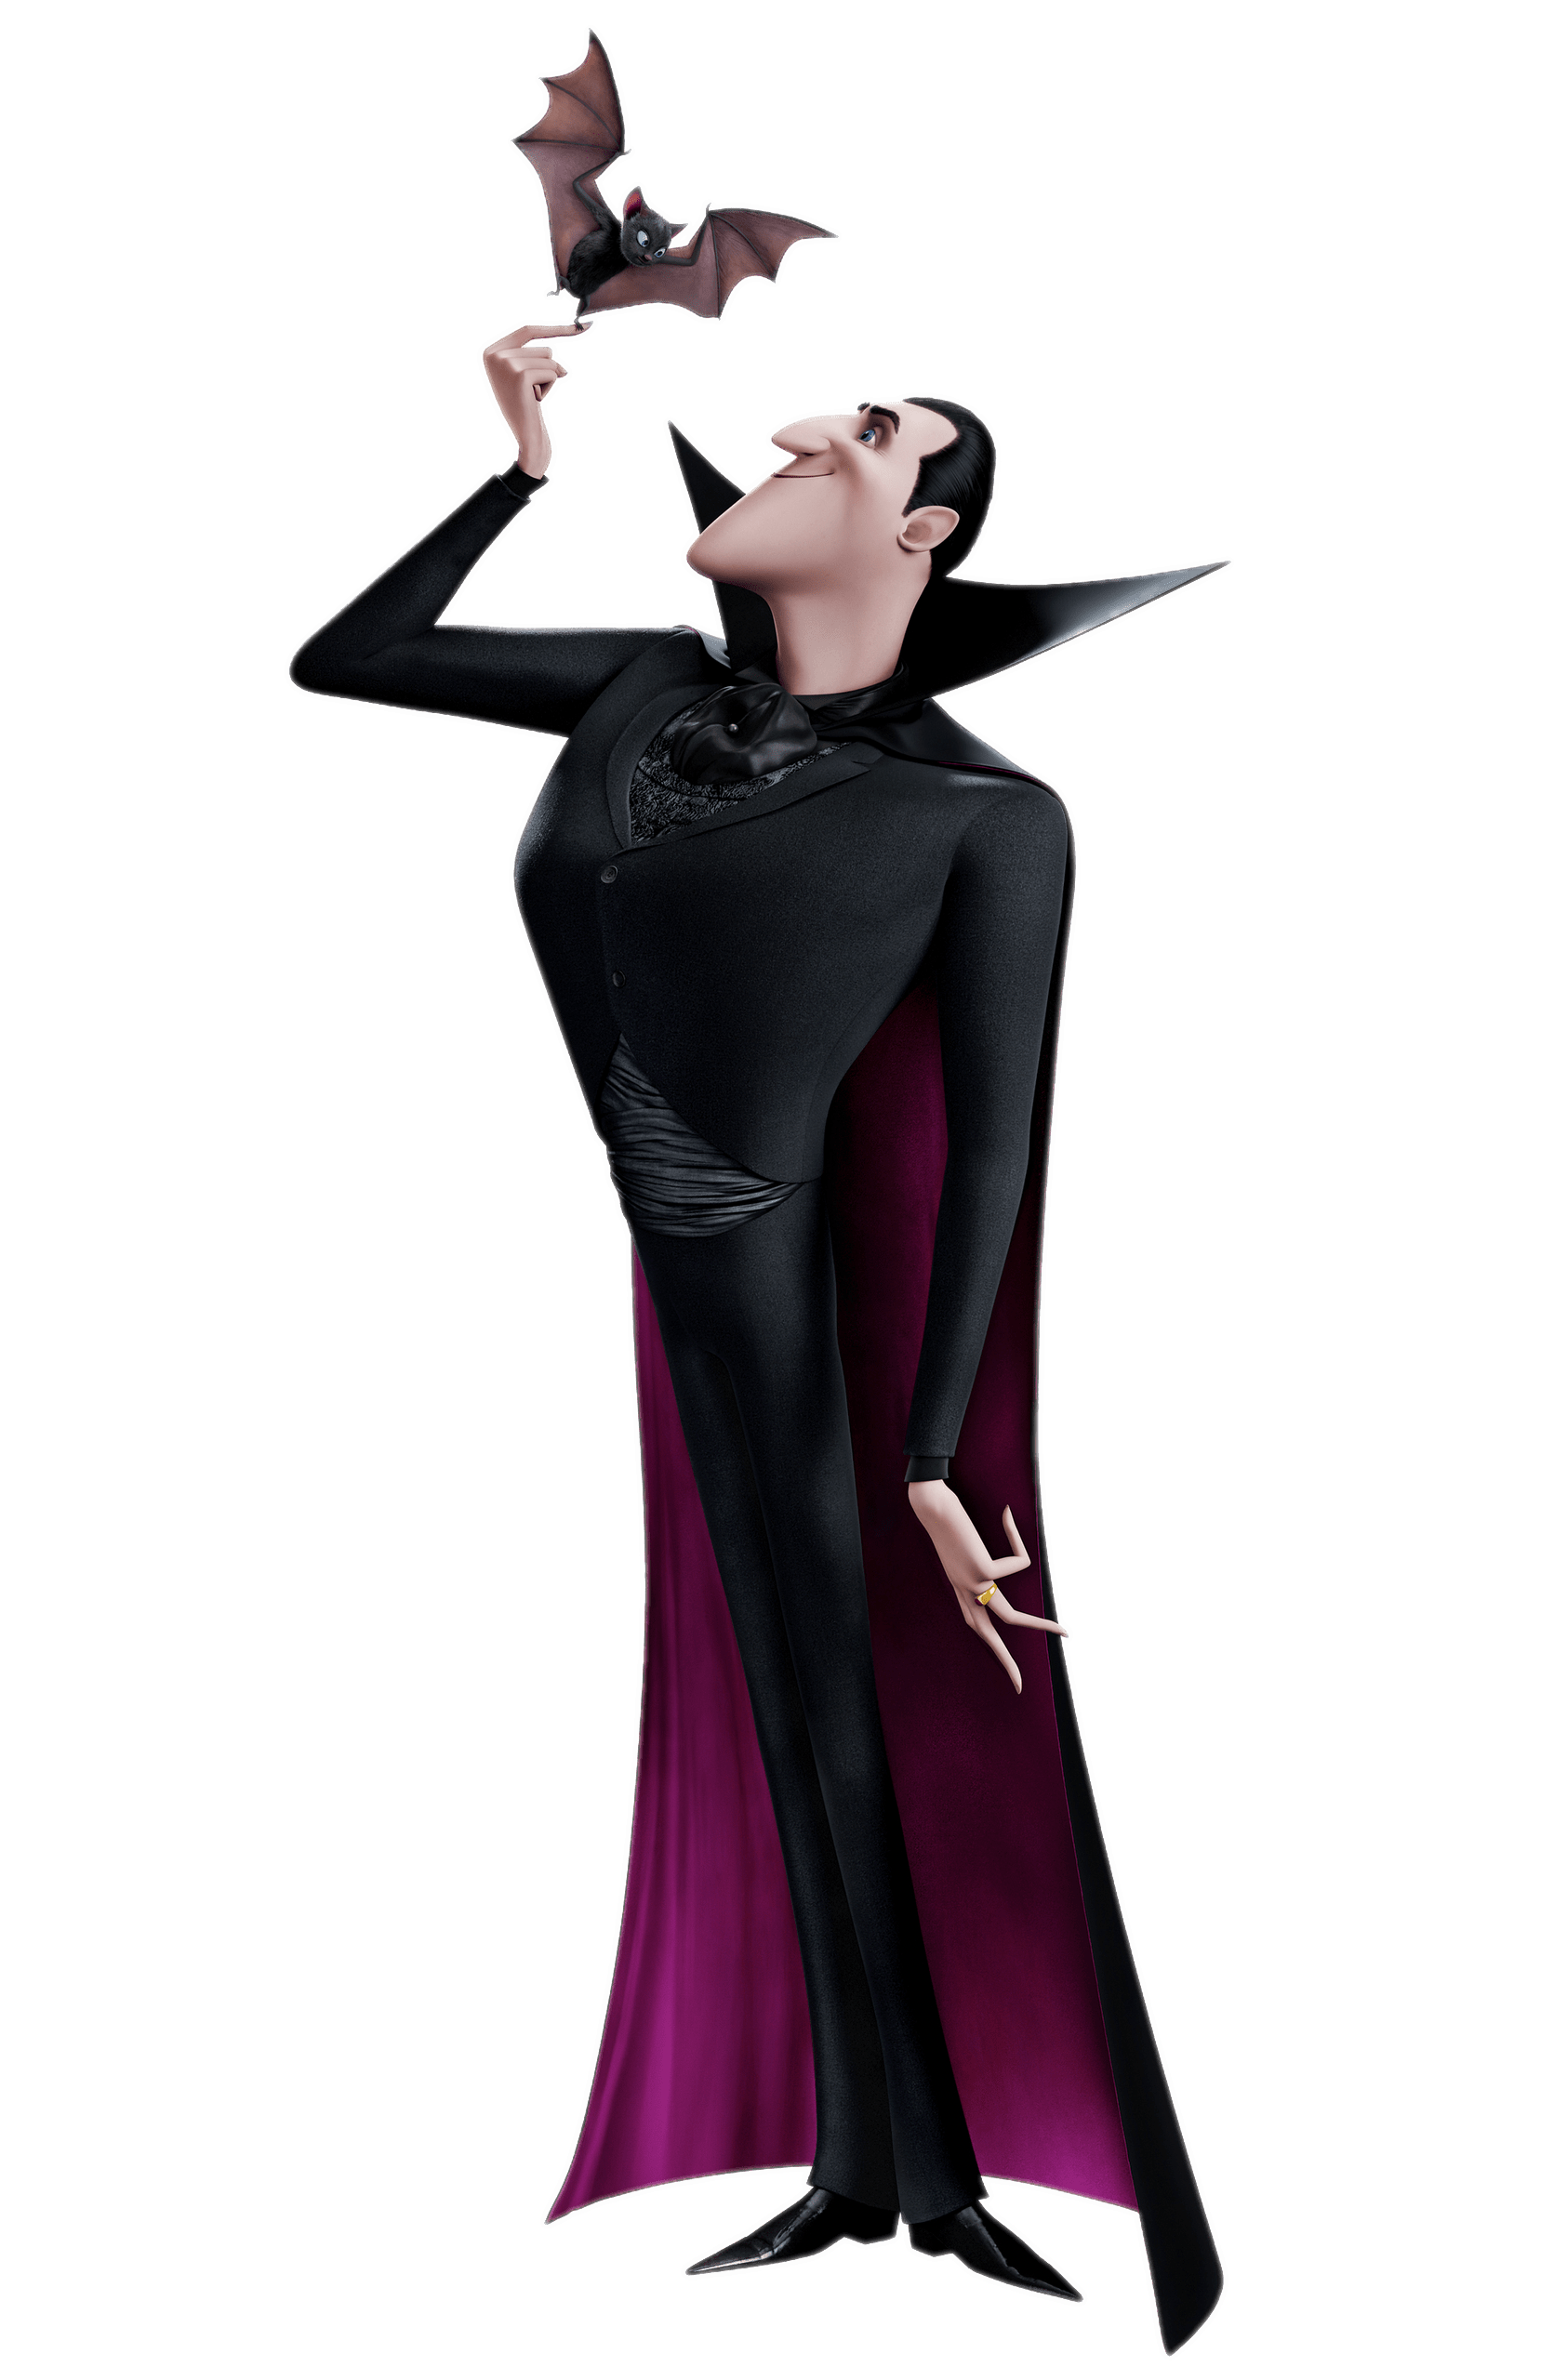 Dracula and Bat transparent PNG.